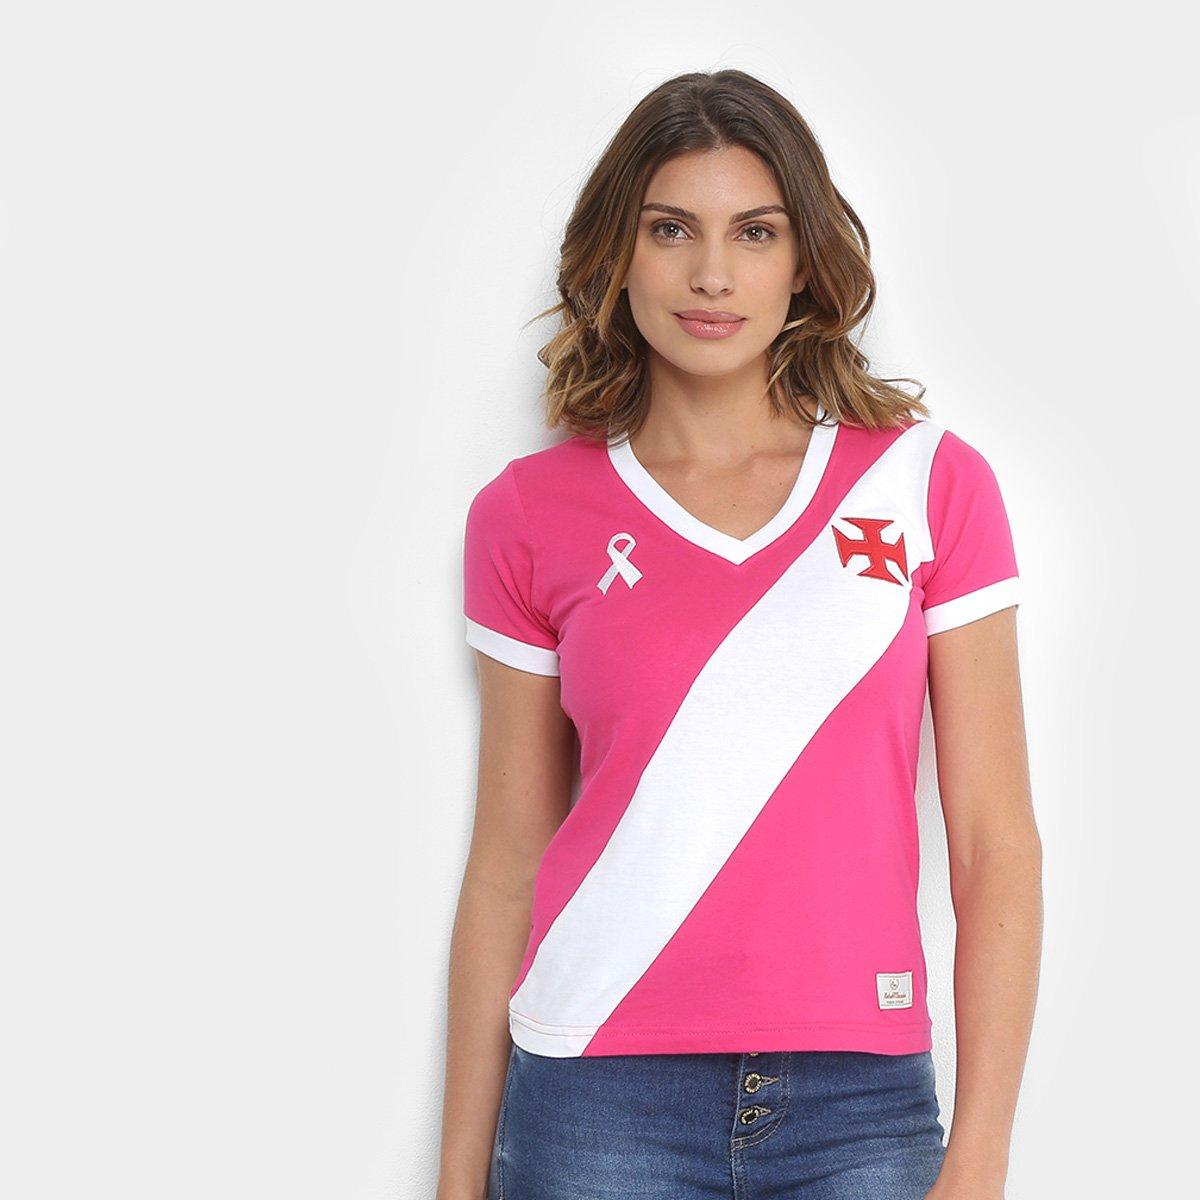 056a604de45dd Camiseta Vasco da Gama Outubro Rosa Feminina - Compre Agora